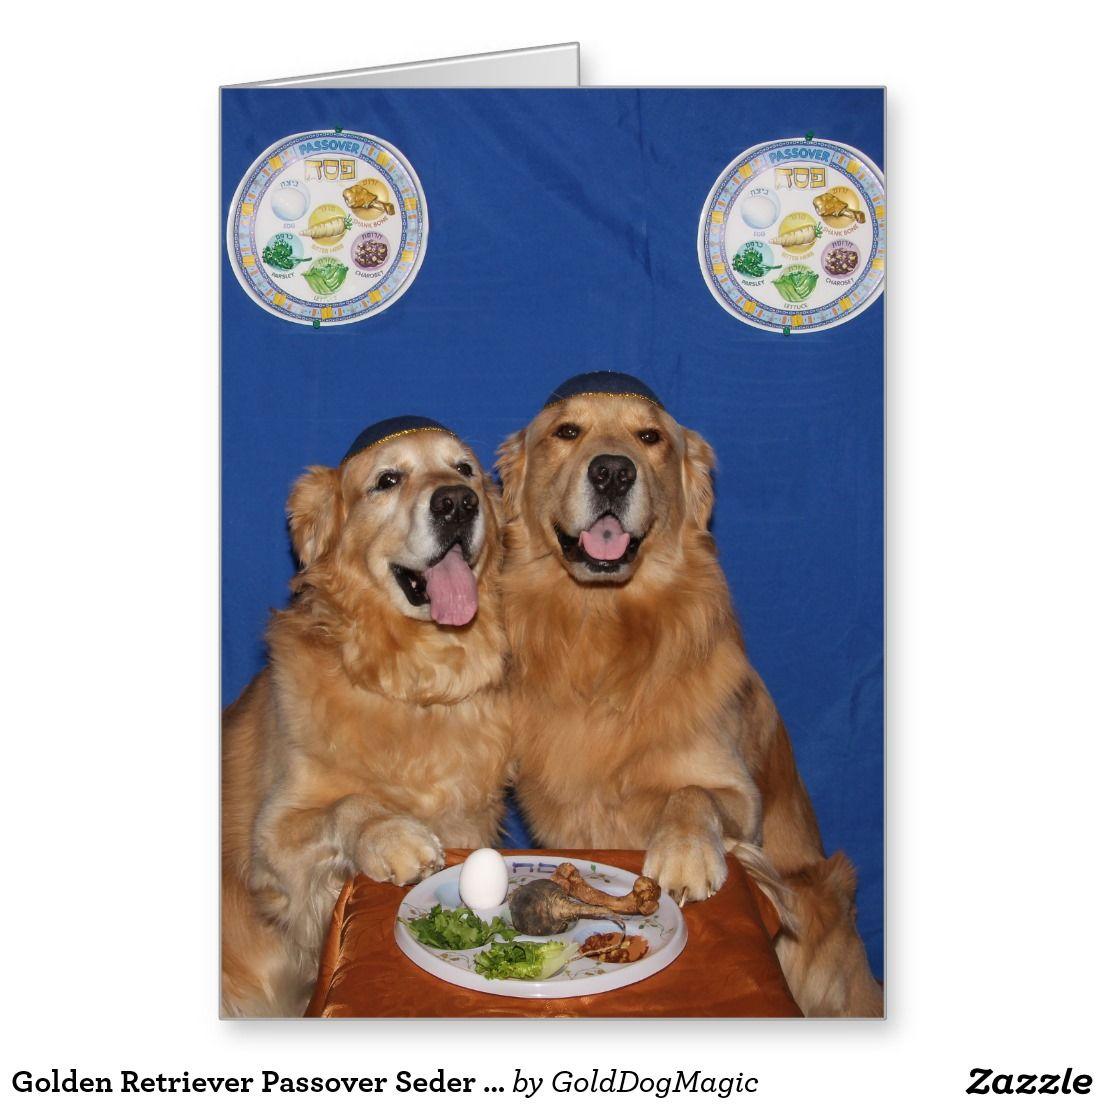 Golden retriever passover seder plate card zazzle greeting cards golden retriever passover seder plate greeting card m4hsunfo